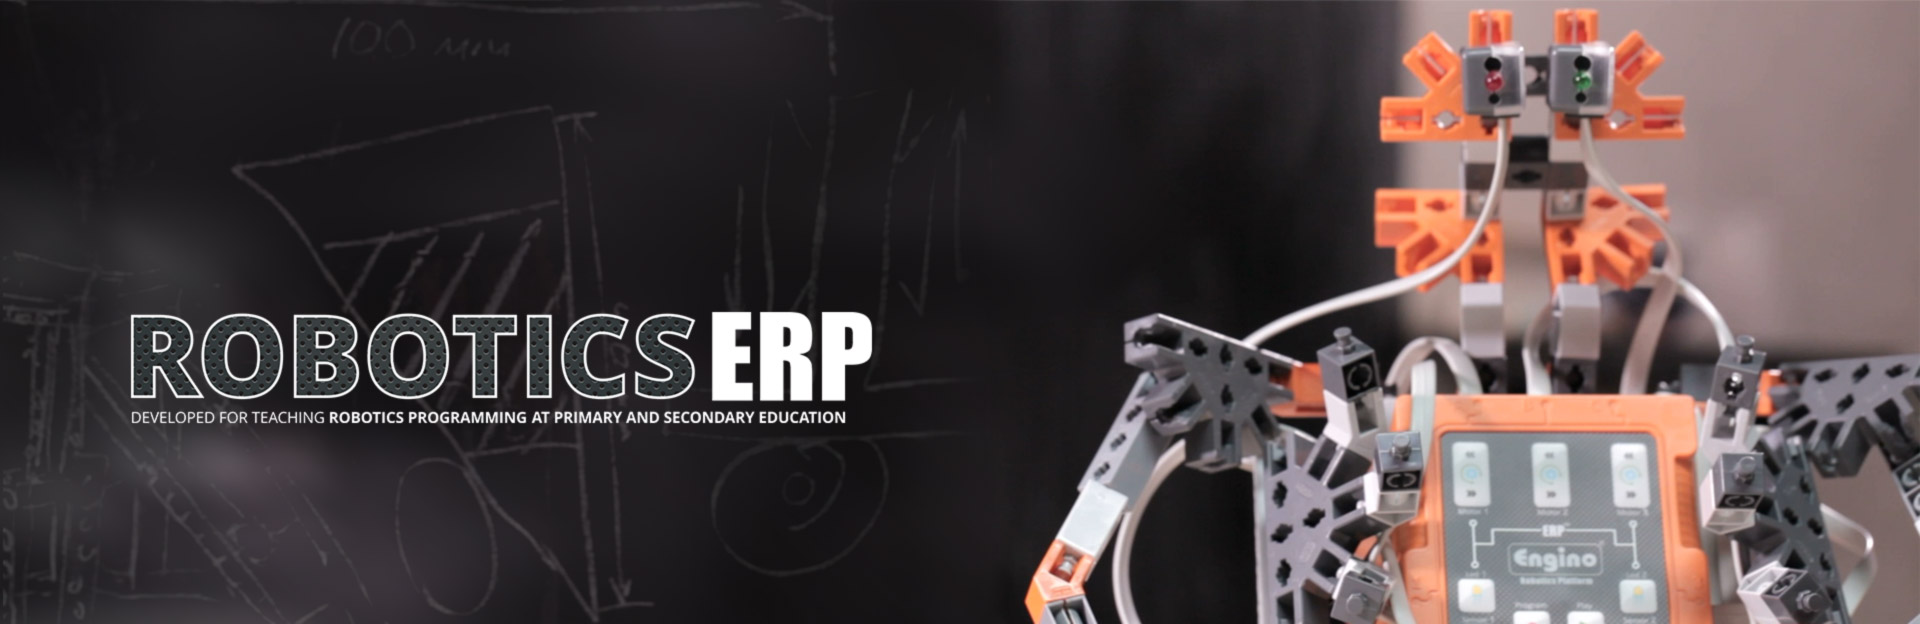 Robotics ERP